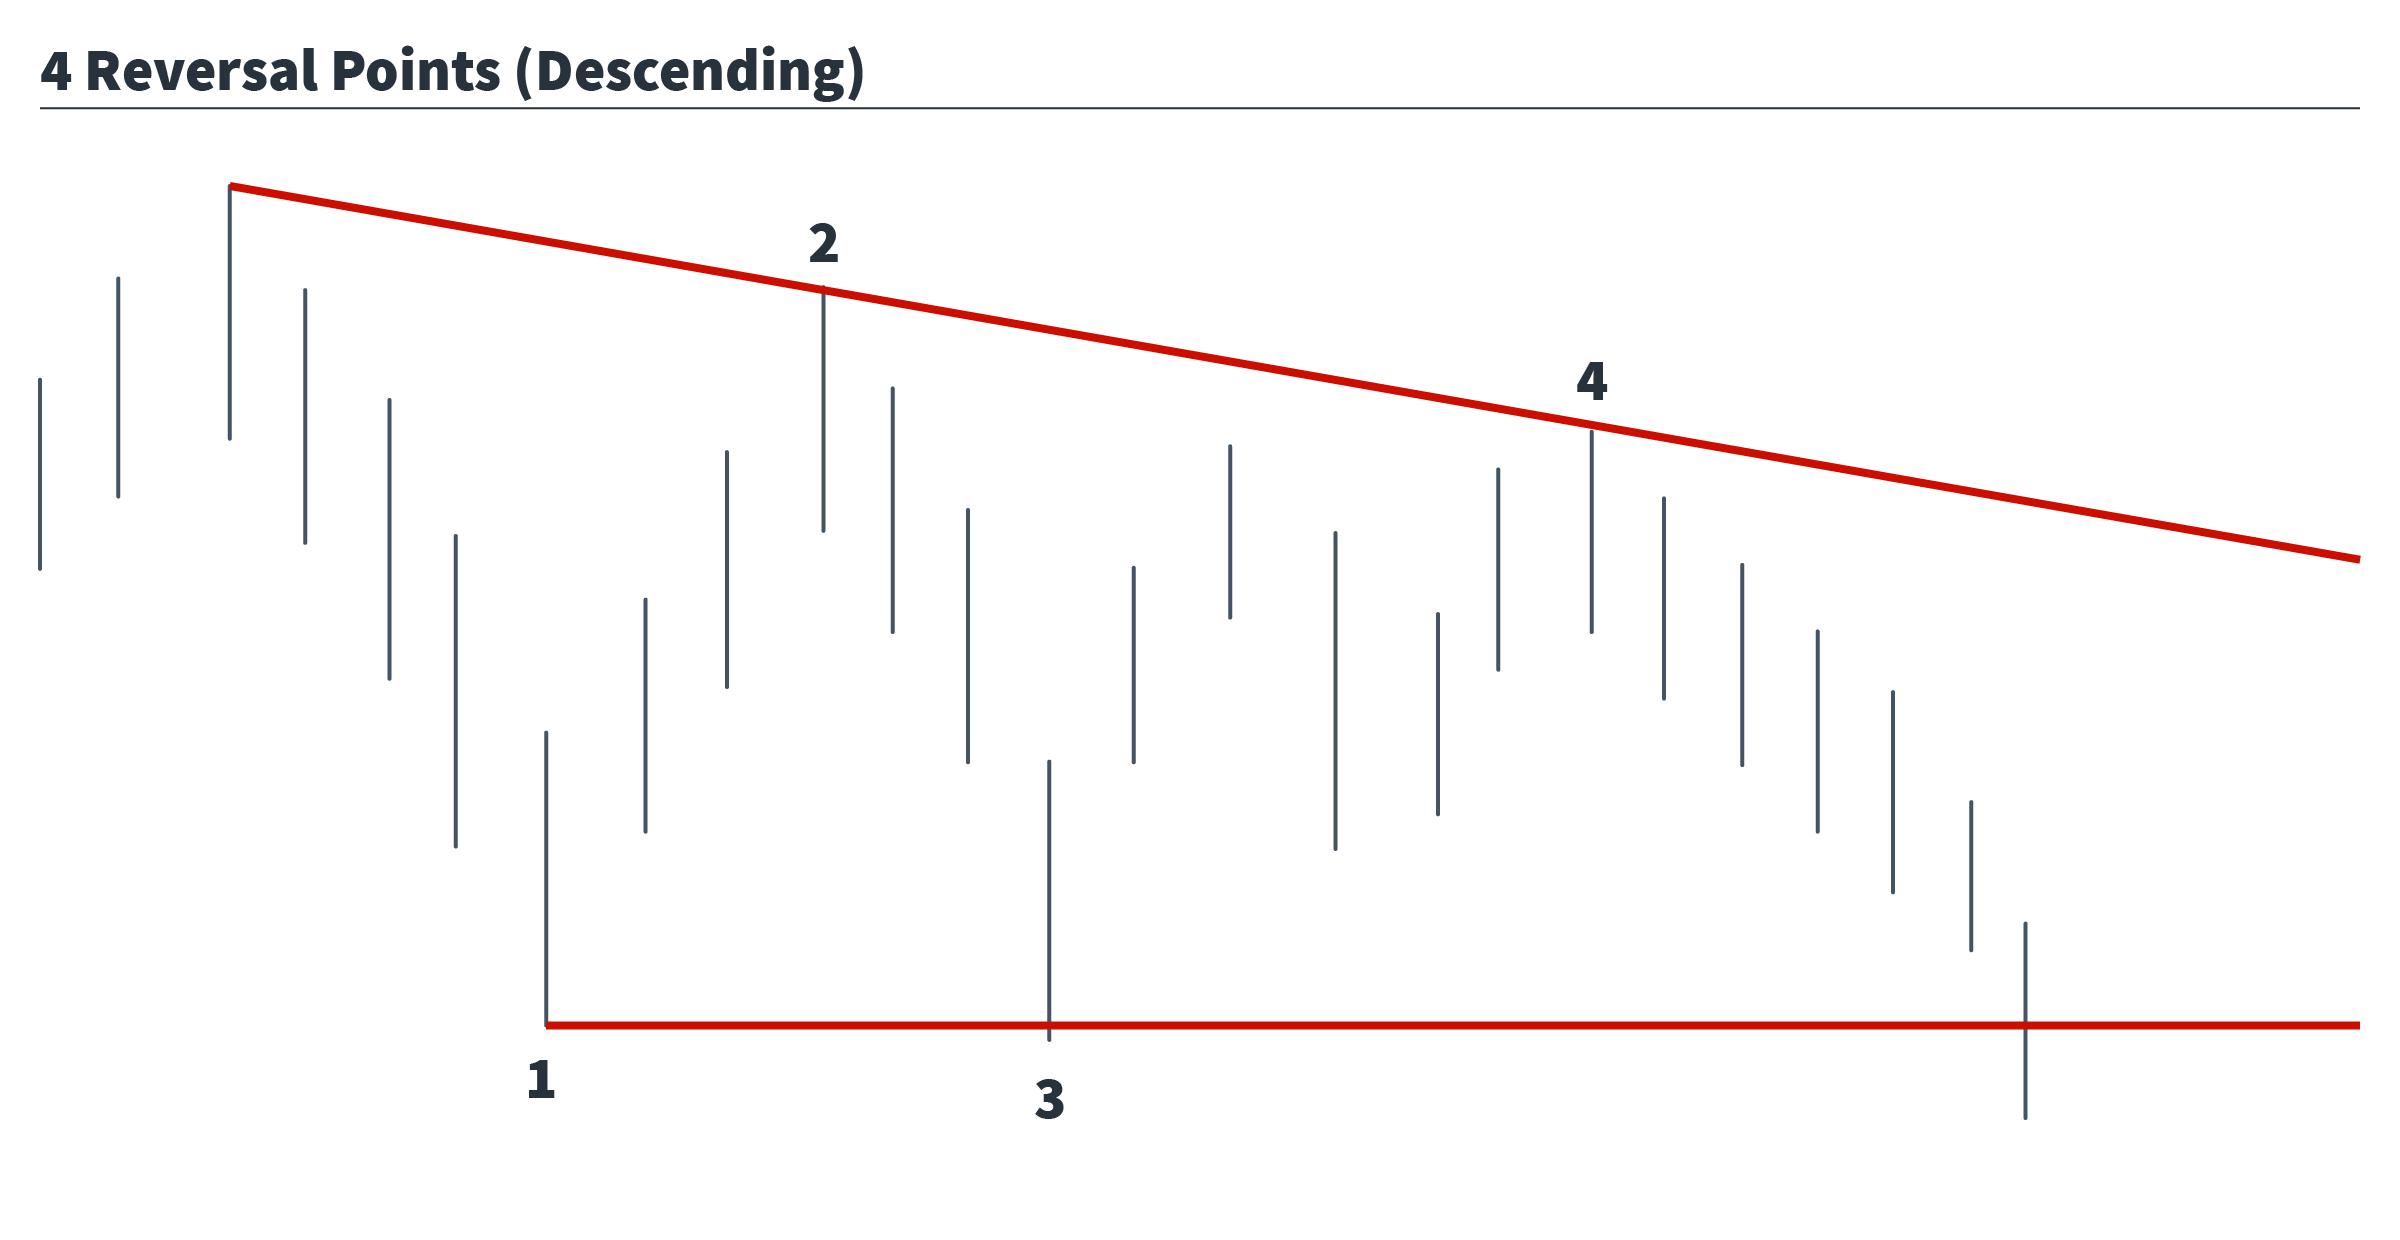 4 point reversal - descending triangle